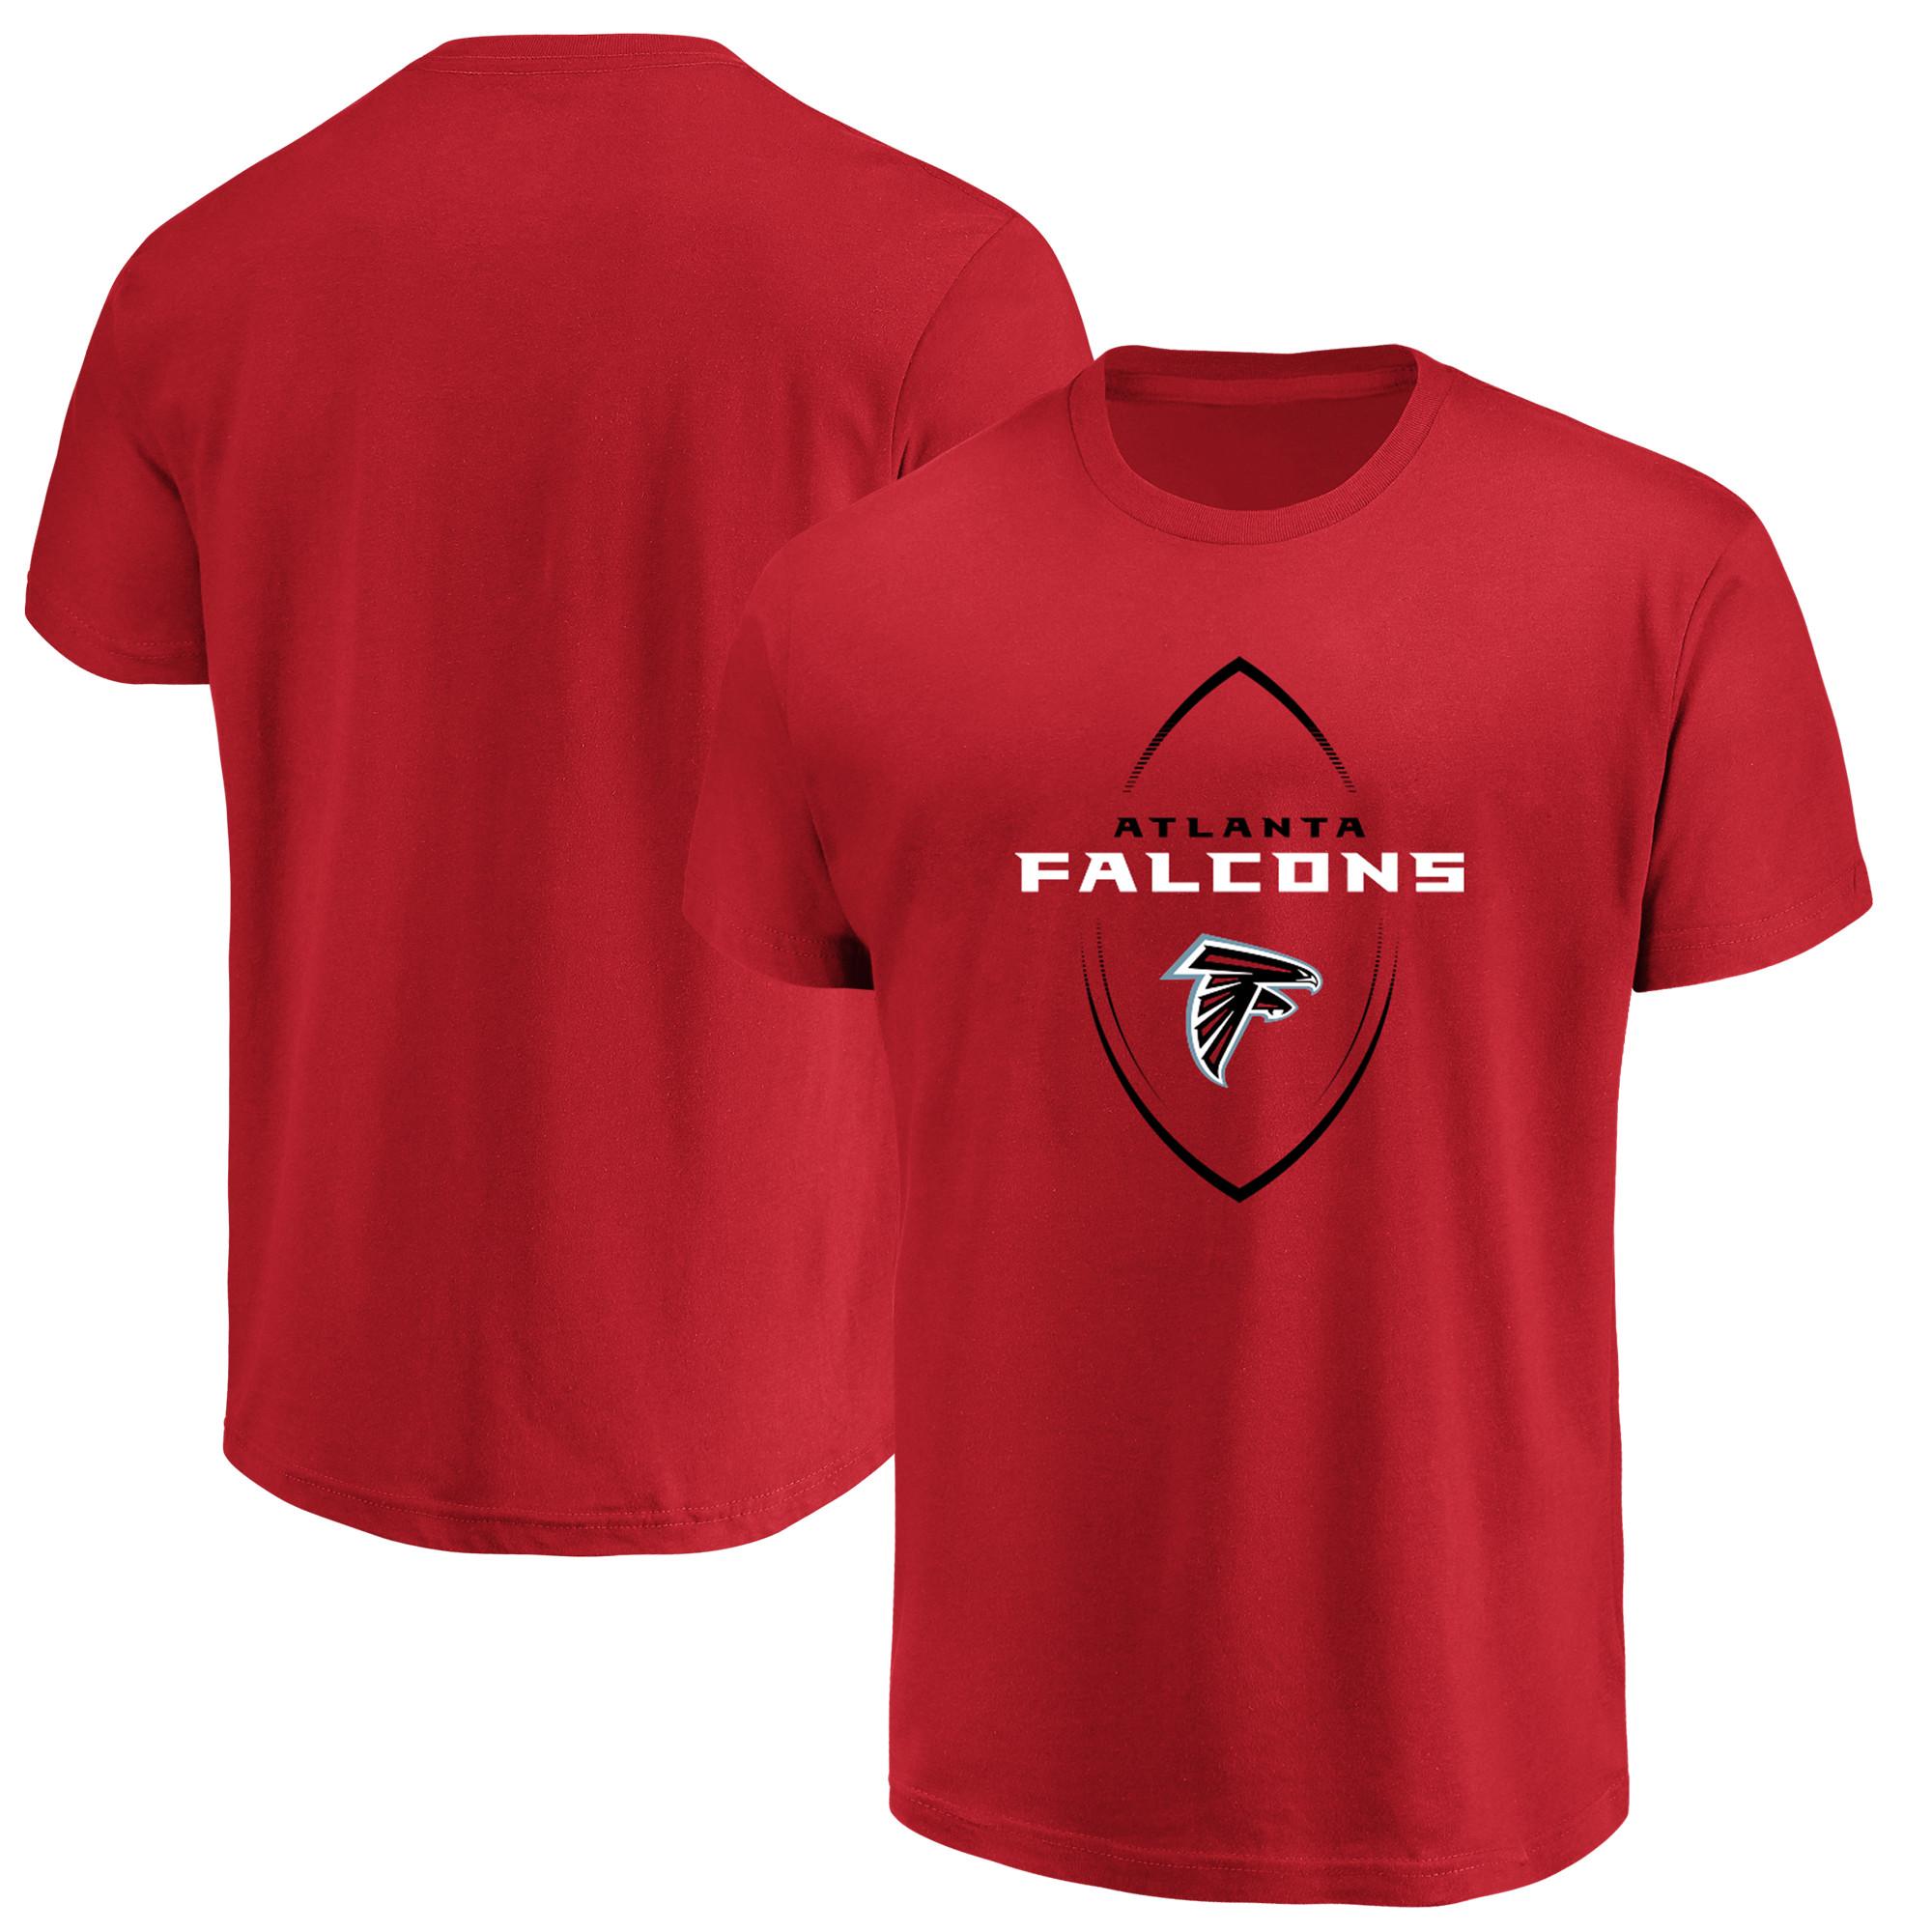 Atlanta Falcons Majestic Maximized Crew Neck T-Shirt - Red